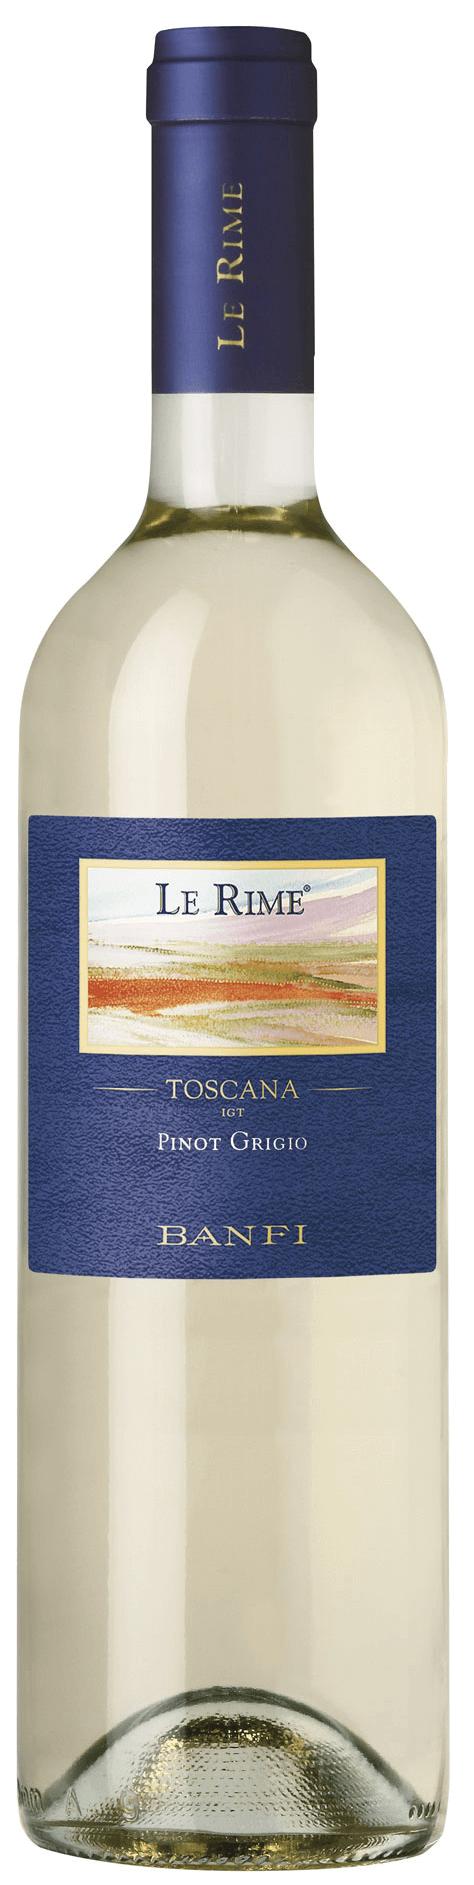 Banfi Le Rime Pinot Grigio 2016